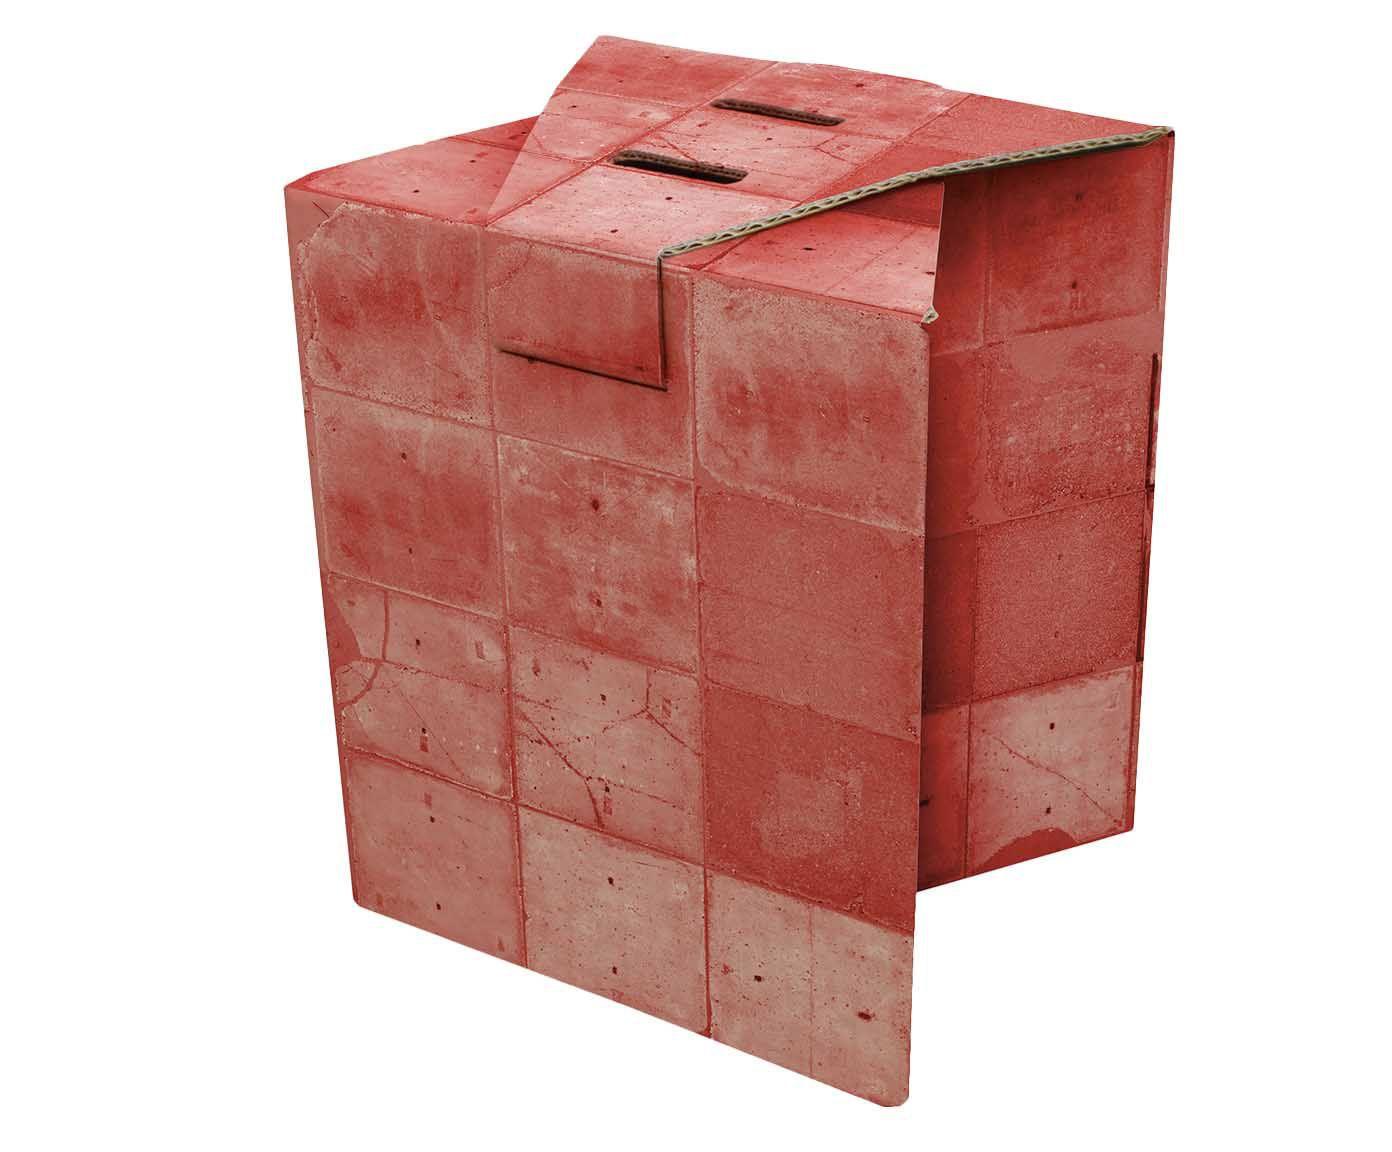 Banco rube tiles - rama   Westwing.com.br